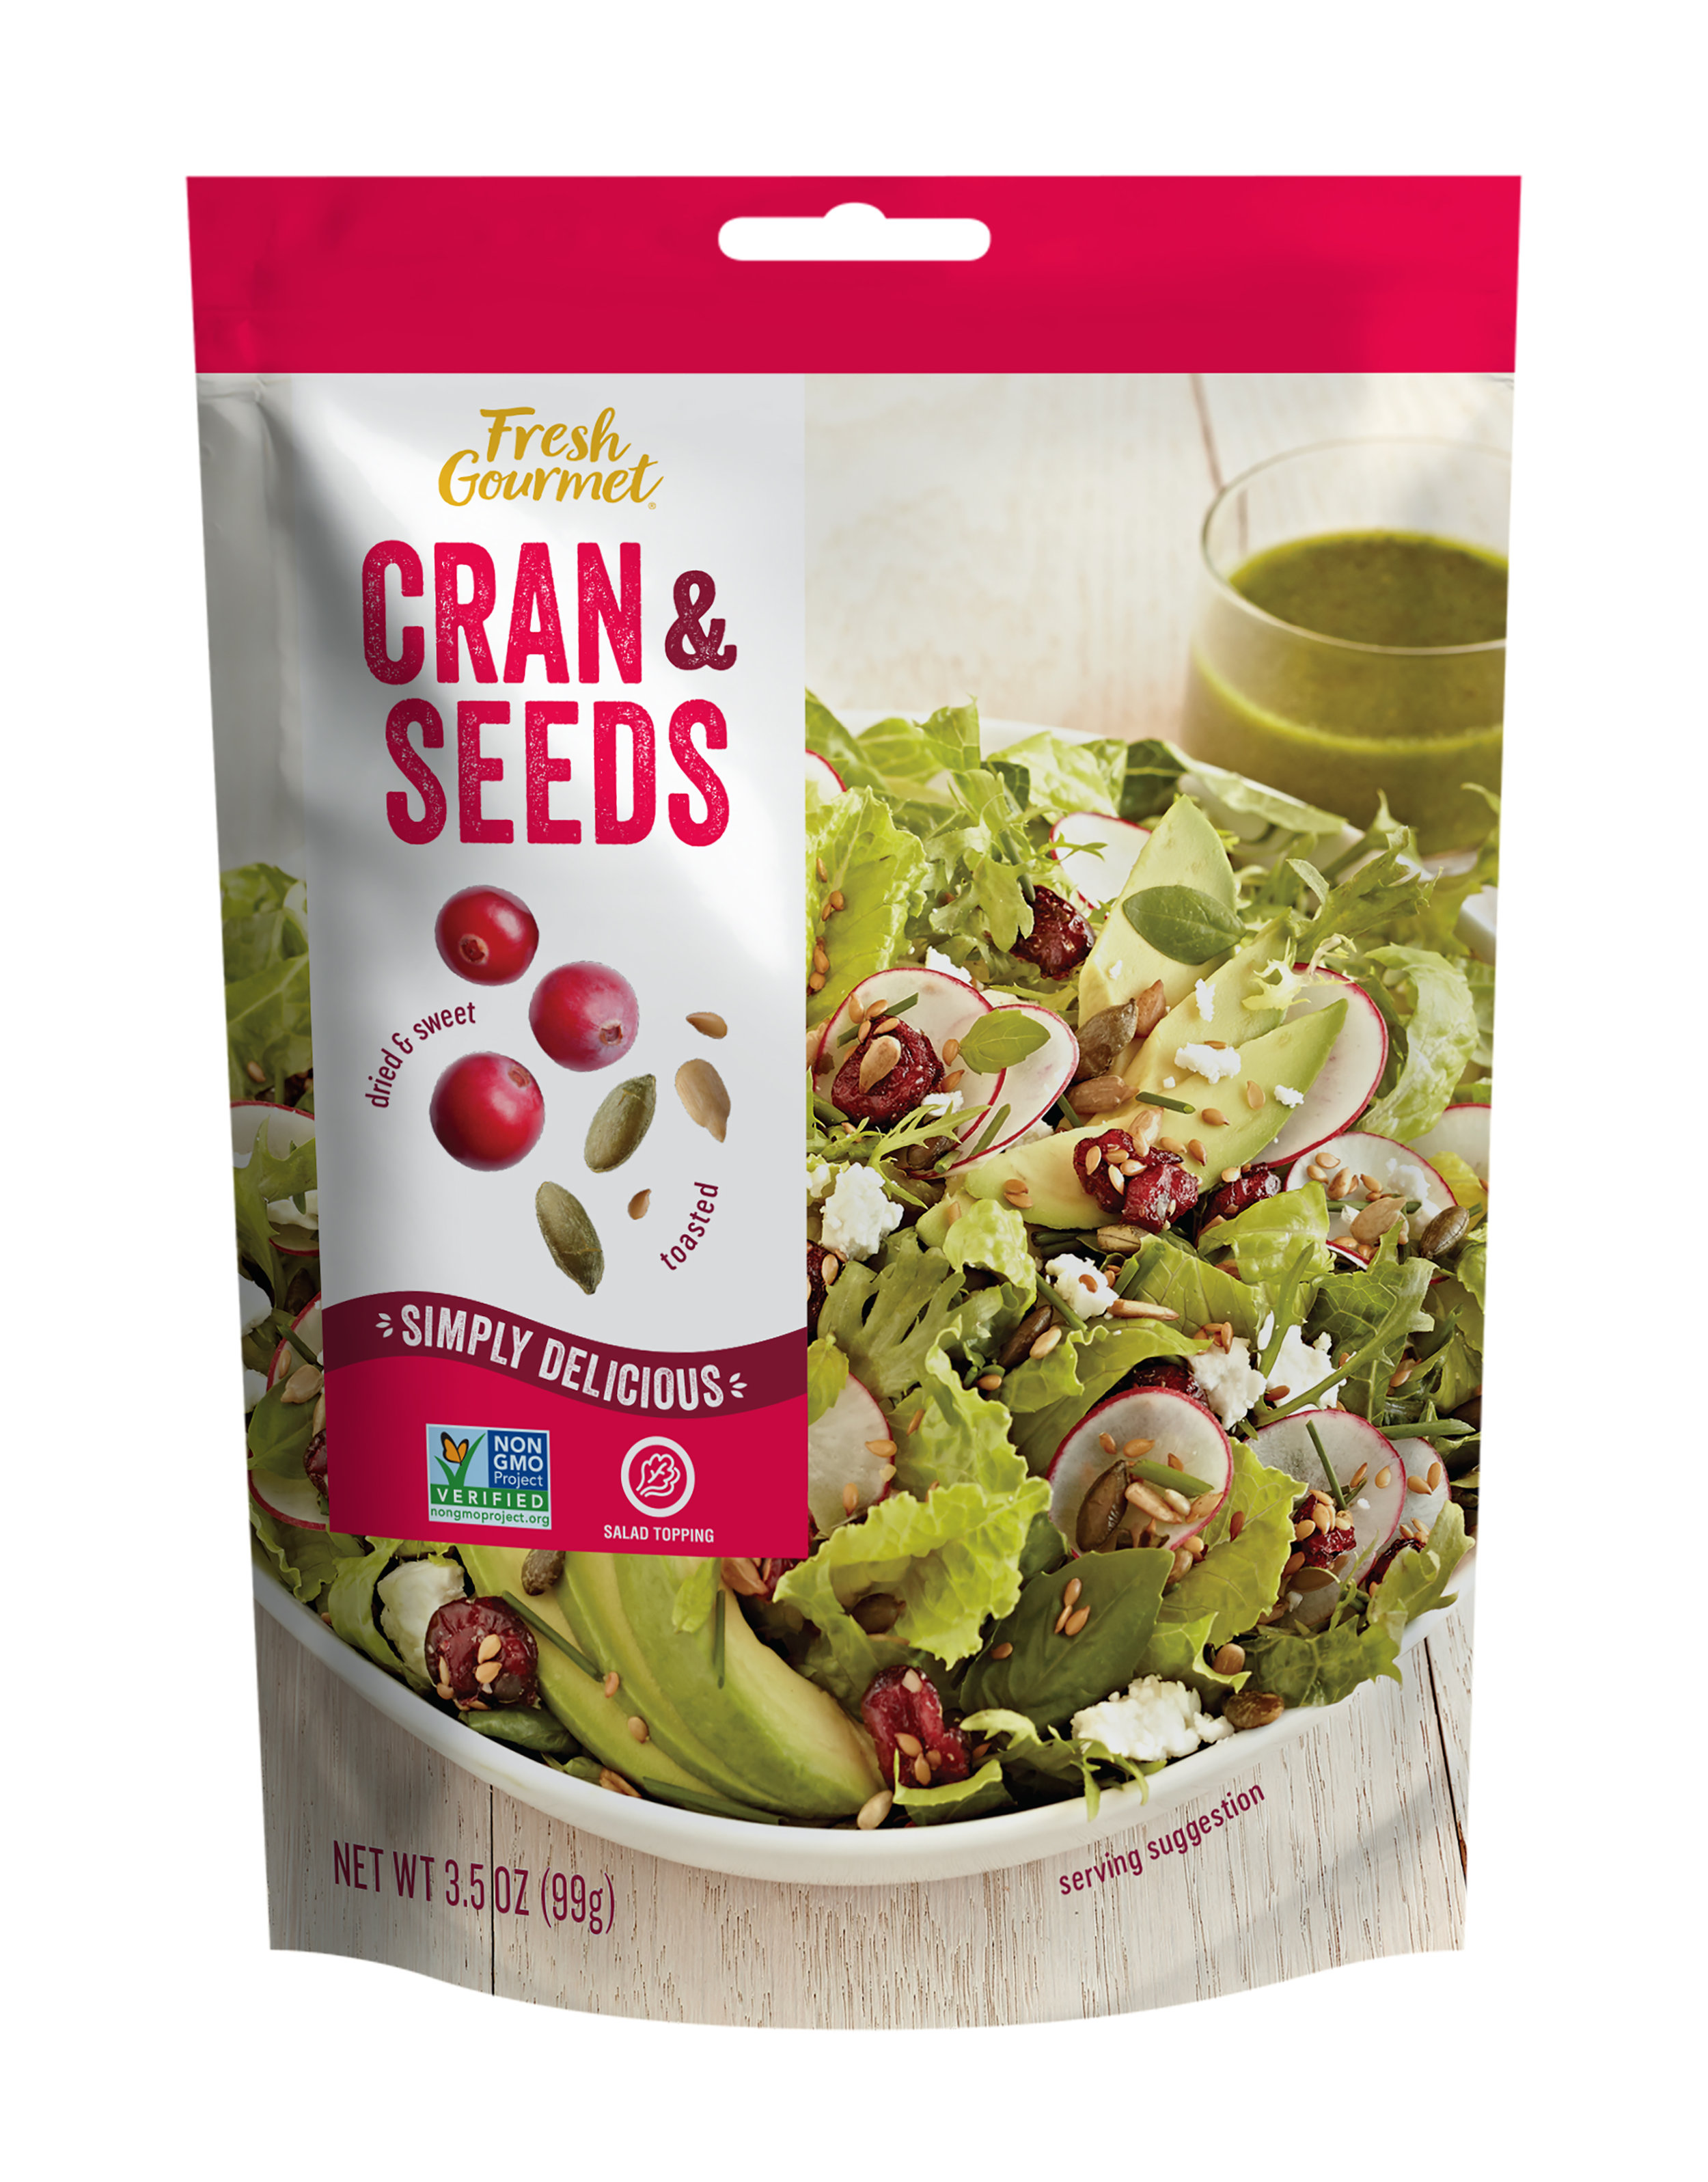 47641-FG-9-3.5-oz-Cran-Seeds-FRONT.jpg